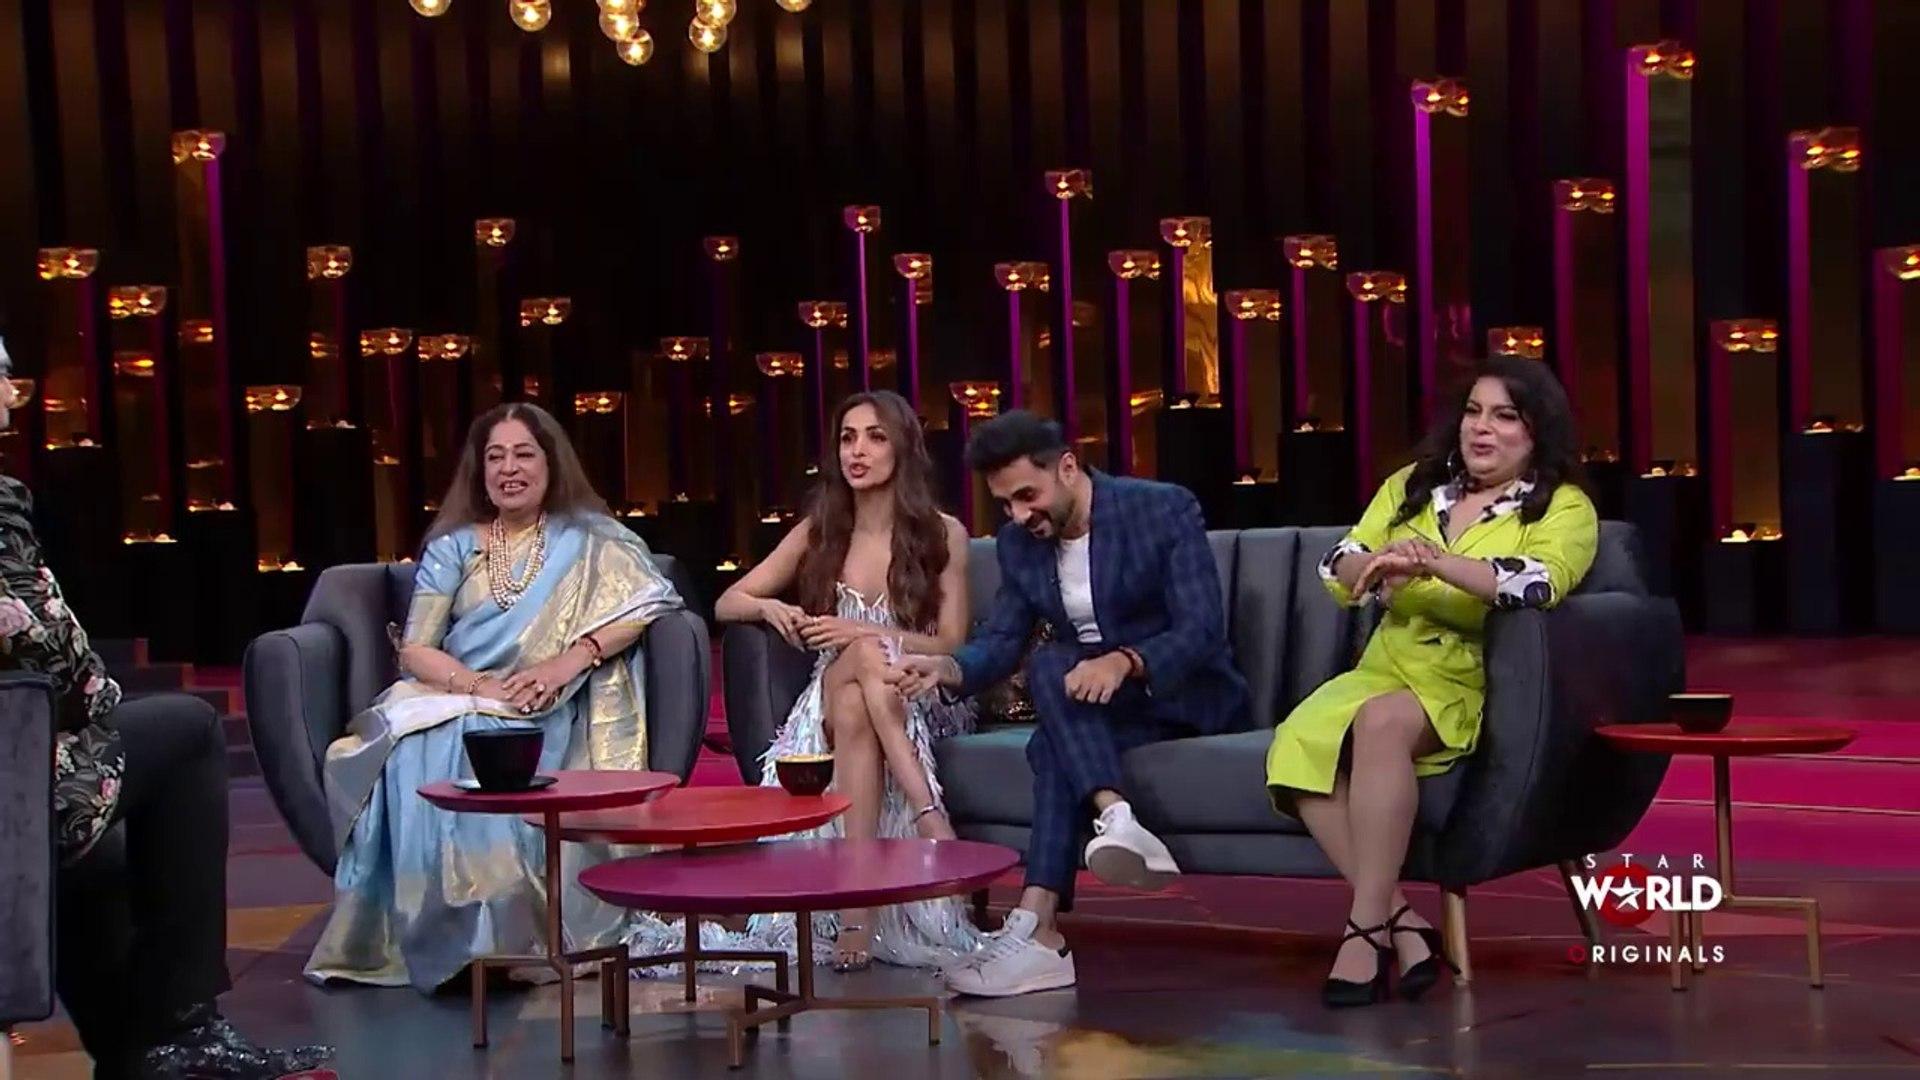 Koffee With Karan Season 6 Episode 20 - Kiran Kher & Malaika Arora